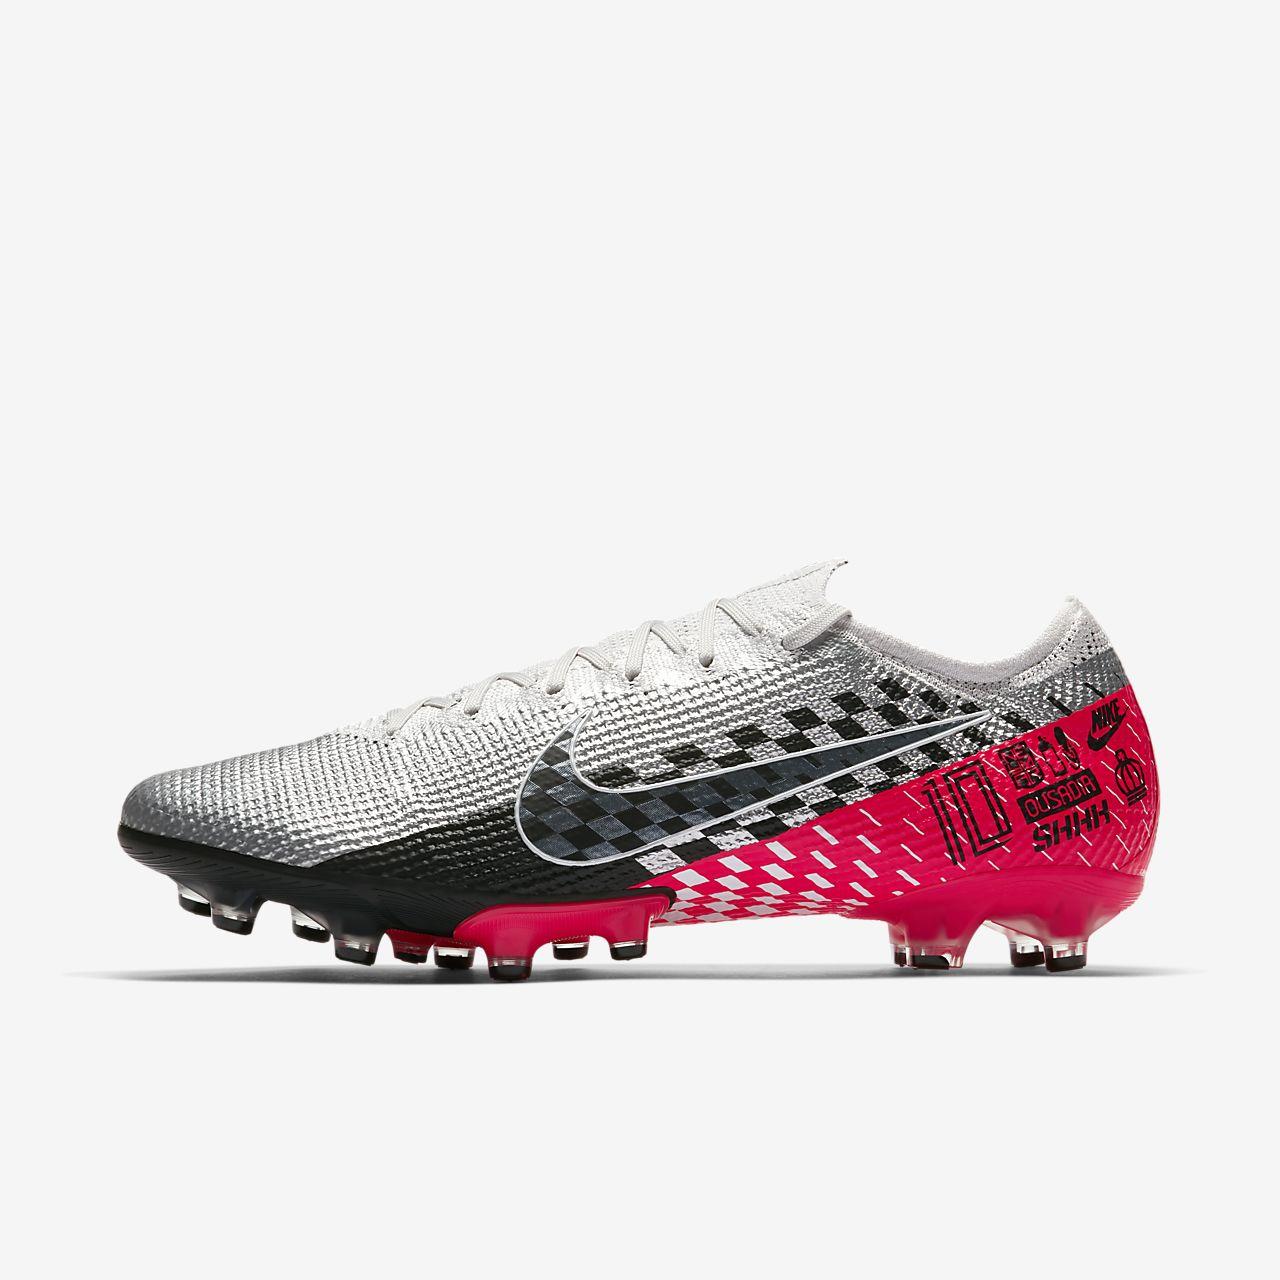 Nike Mercurial Vapor 13 Elite Neymar Jr. AG-PRO Fußballschuh für Kunstrasen